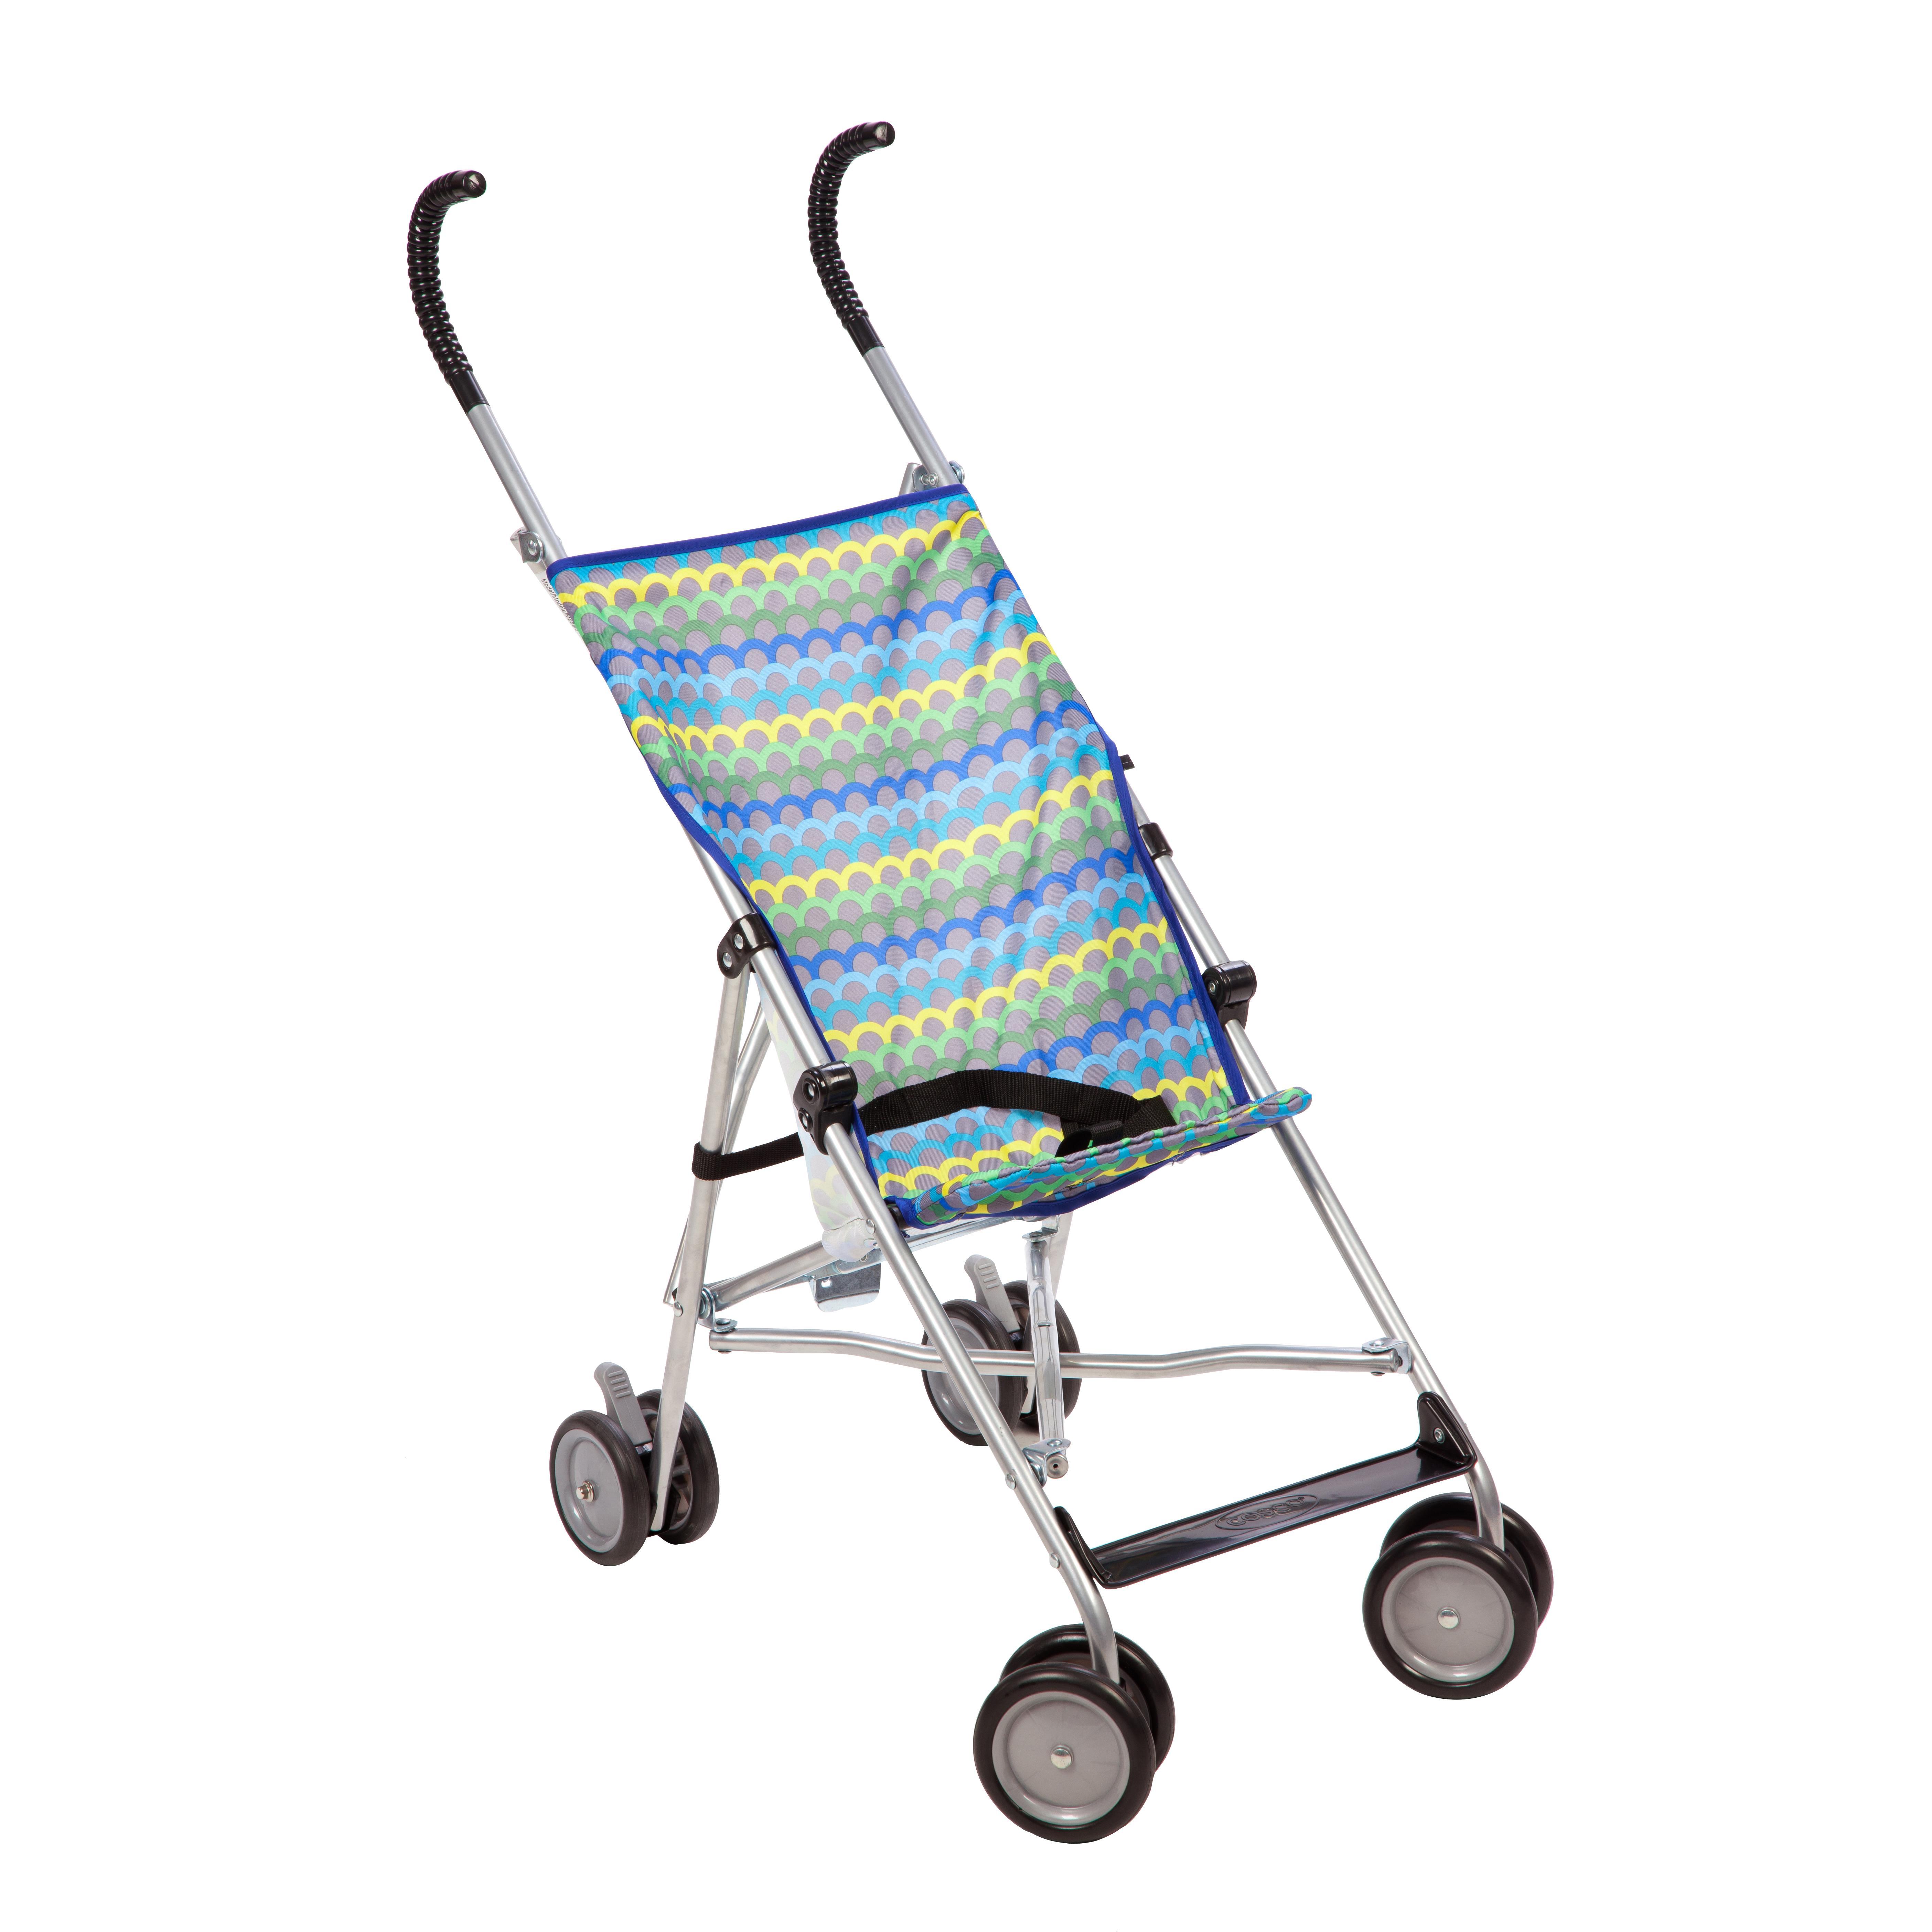 Cosco® Umbrella Stroller Without Canopy Horizon - [US116AXH1]  sc 1 st  OJ Commerce & Cosco® Umbrella Stroller Without Canopy Horizon | OJCommerce